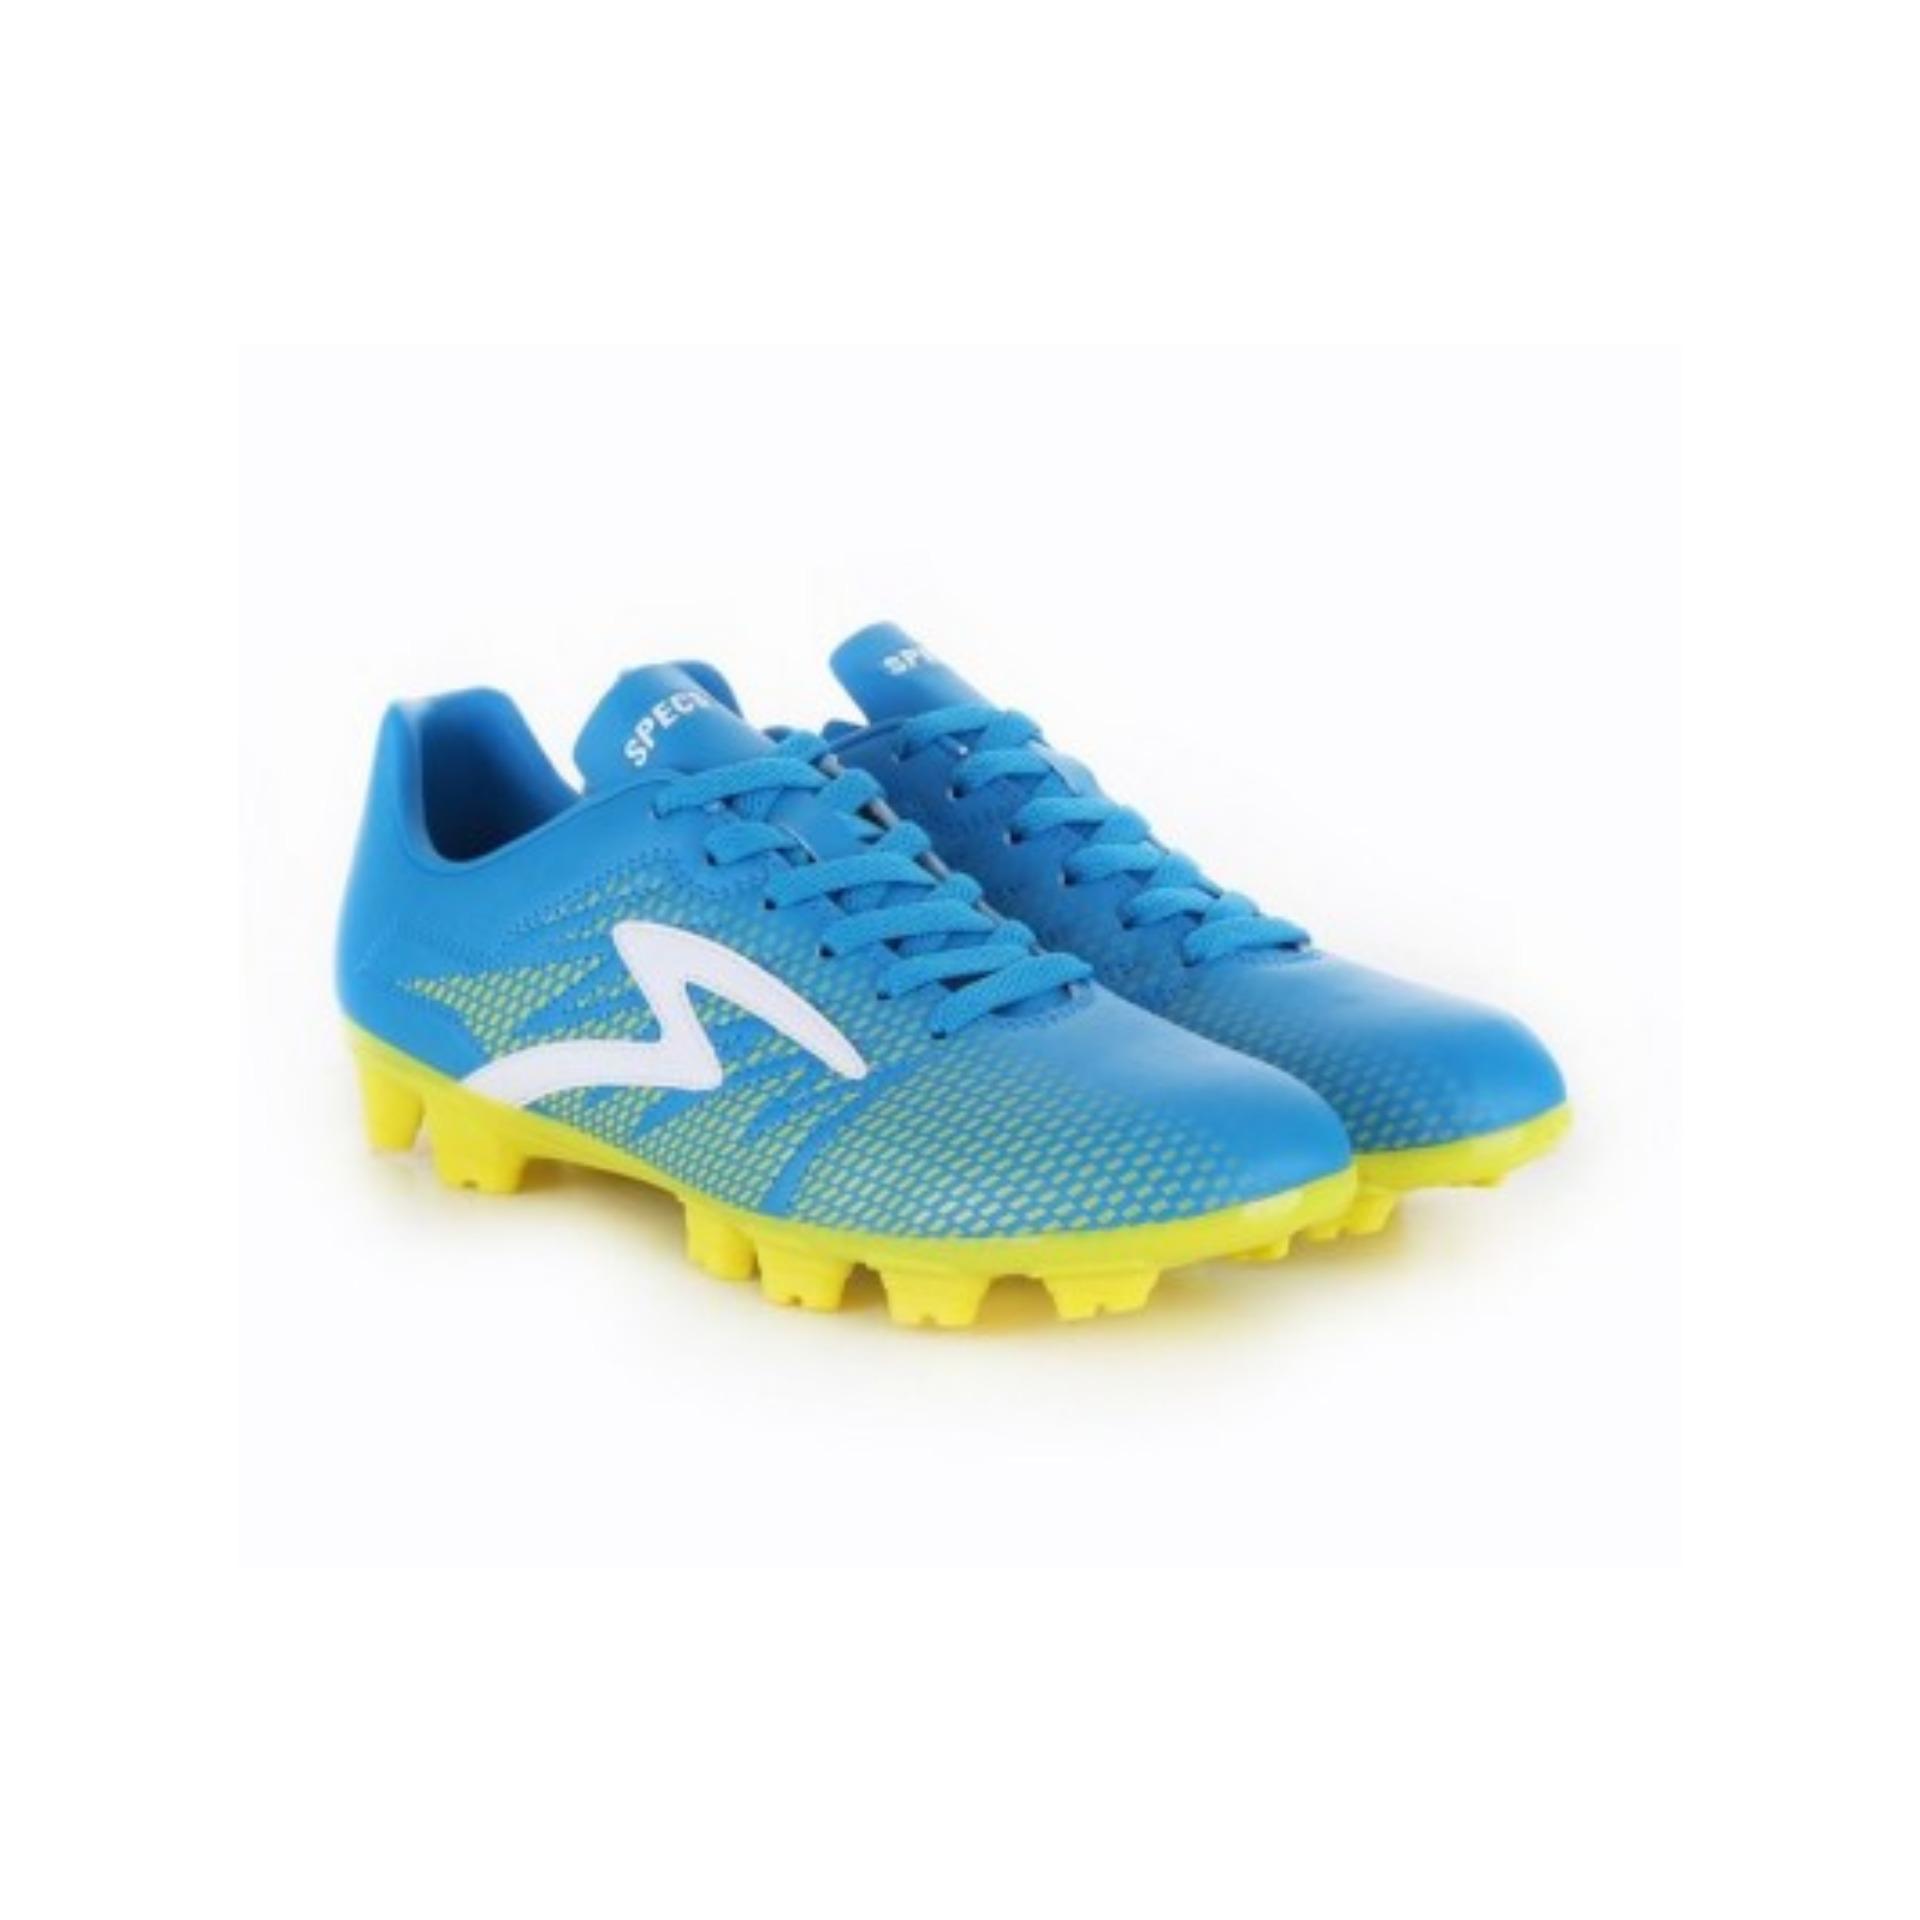 Specs Apache FG Arctic Blue Solar Slime White   Sepatu Sepak Bola